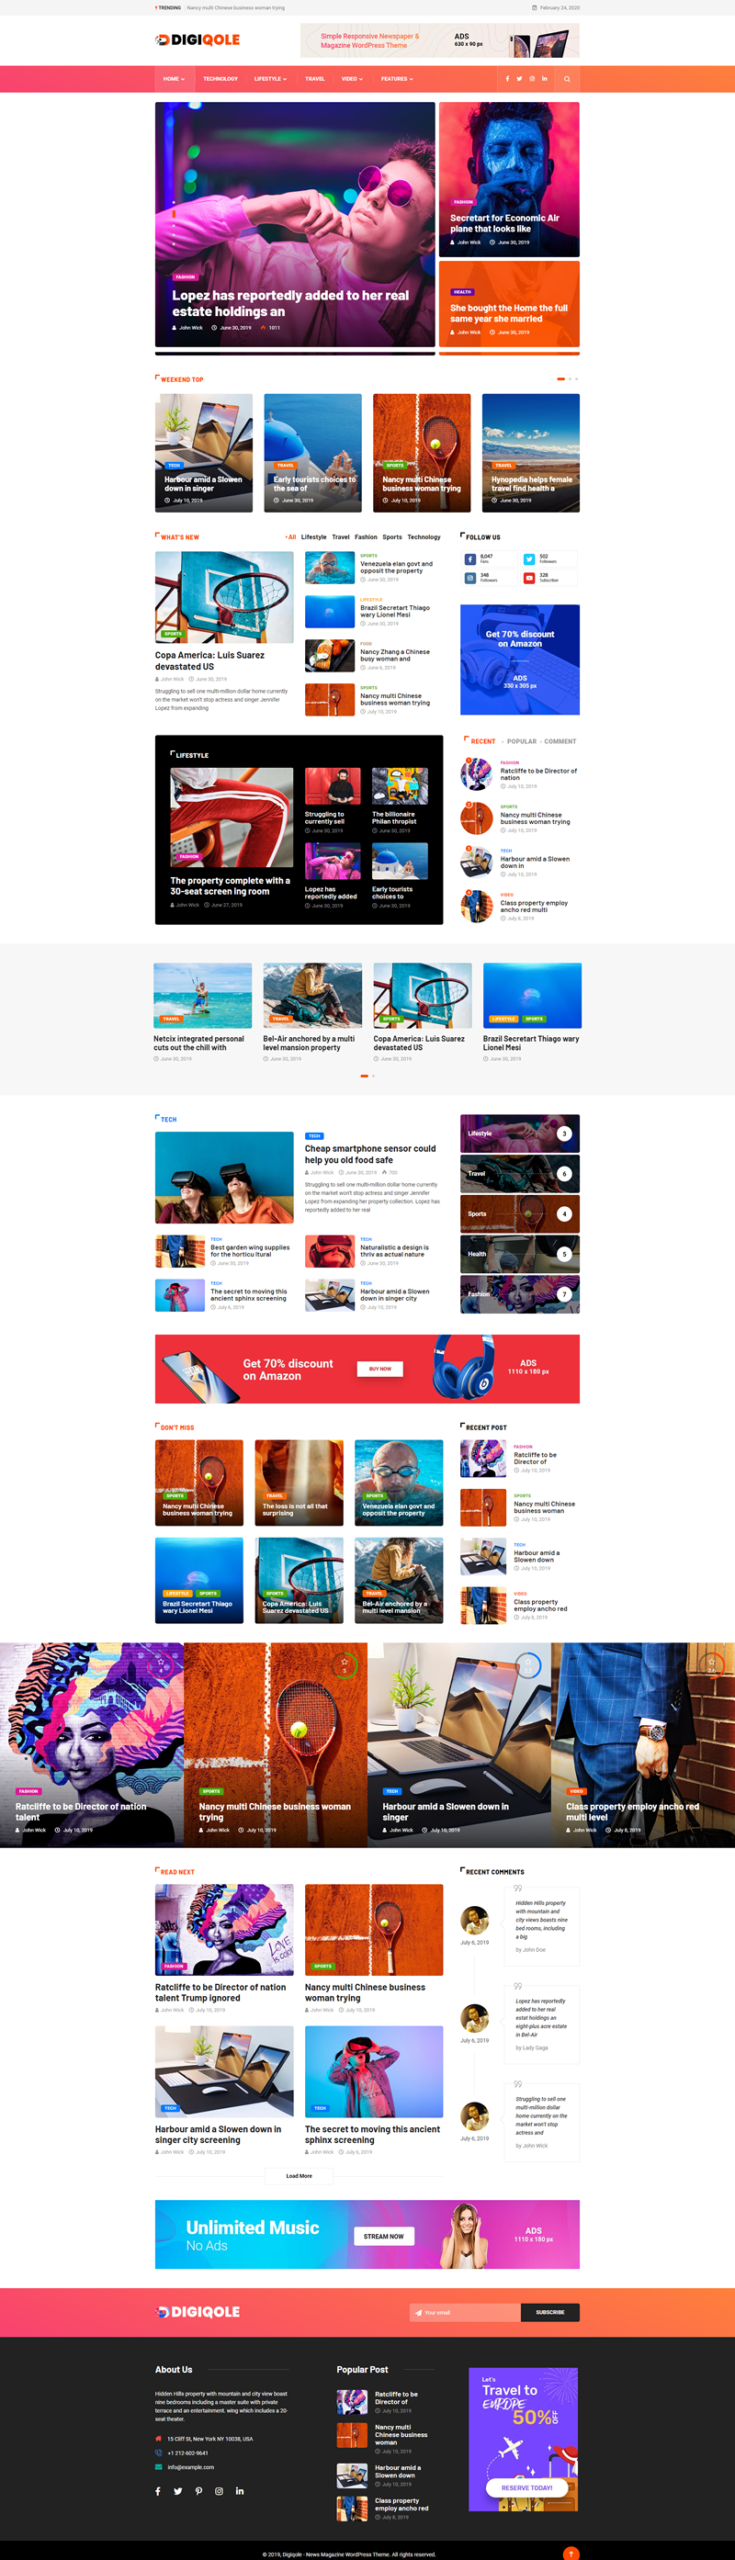 Digiqole - best WordPress themes